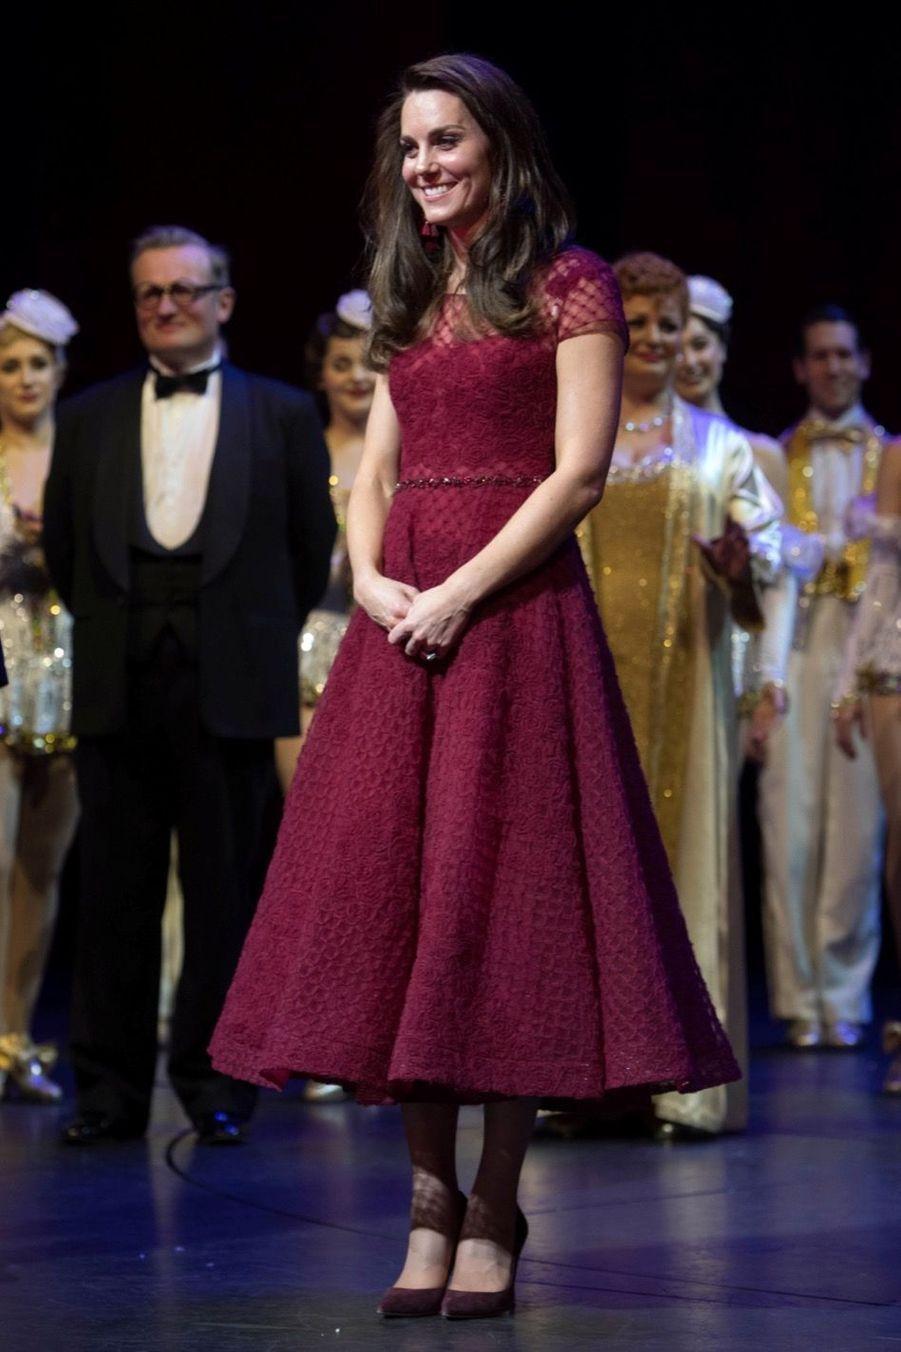 Kate Middleton Au Theatre Royal Drury Lane De Londres Mardi 4 Avril 2017 23